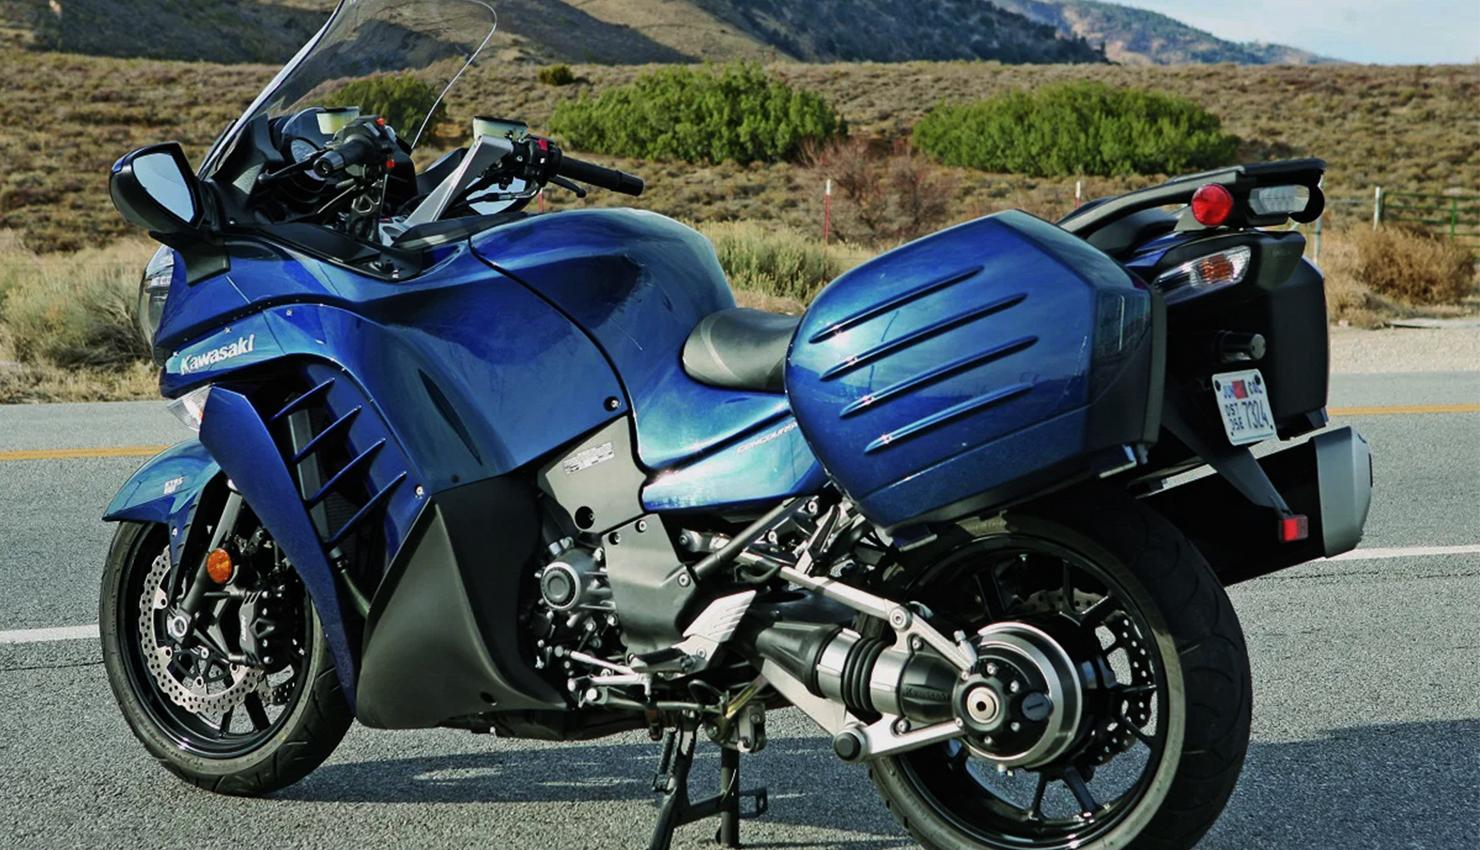 moto-vento-Kawasaki-deportiva-magazinehorse